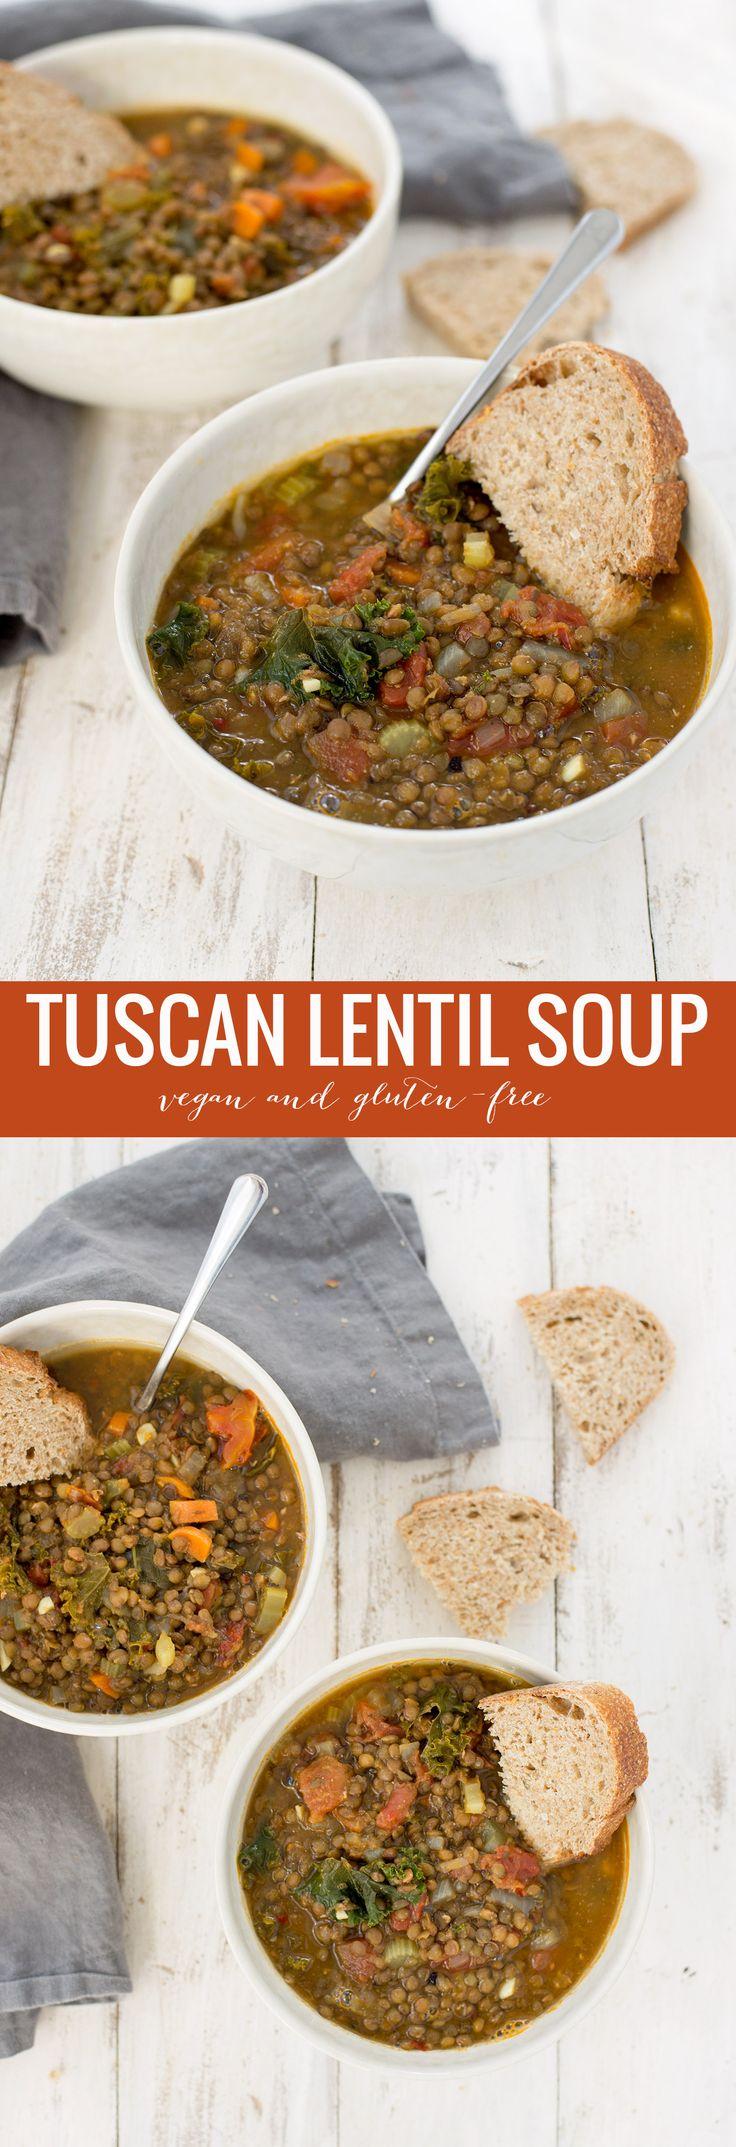 Tuscan Lentil Soup! An Italian take on classic lentil soup. Vegan and Gluten-Free. | www.delishknowledge.com